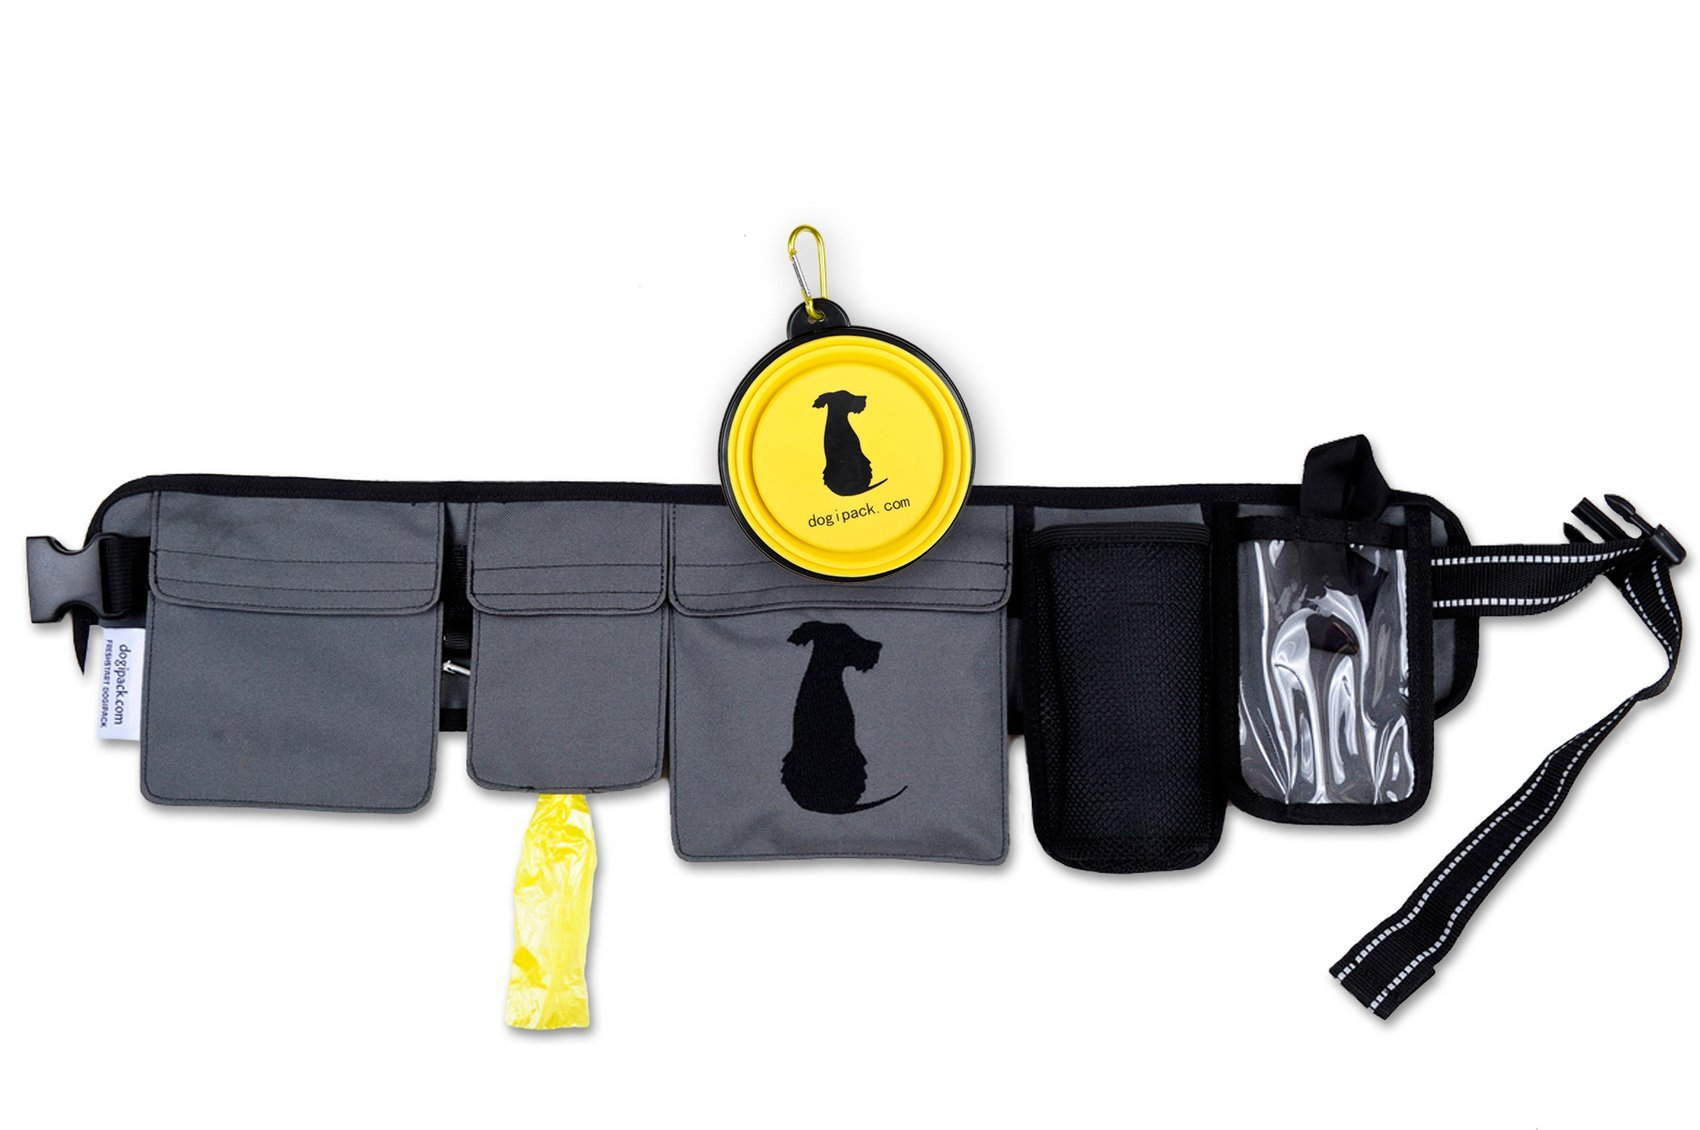 FreshStart DogiPack Hands Free and Organizational Dog Walking Belt (Grey)